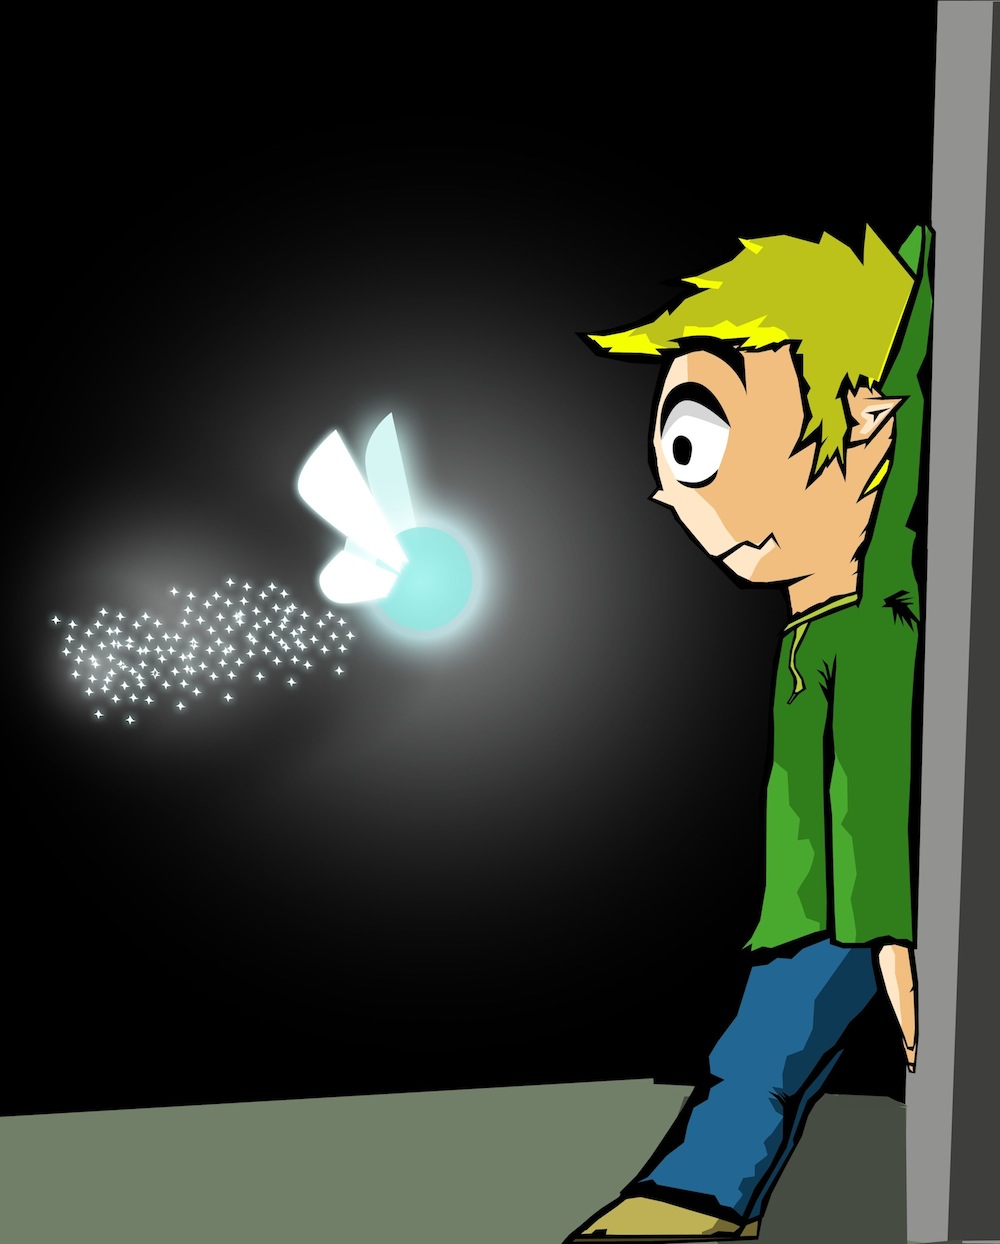 Link Meets A Fairy